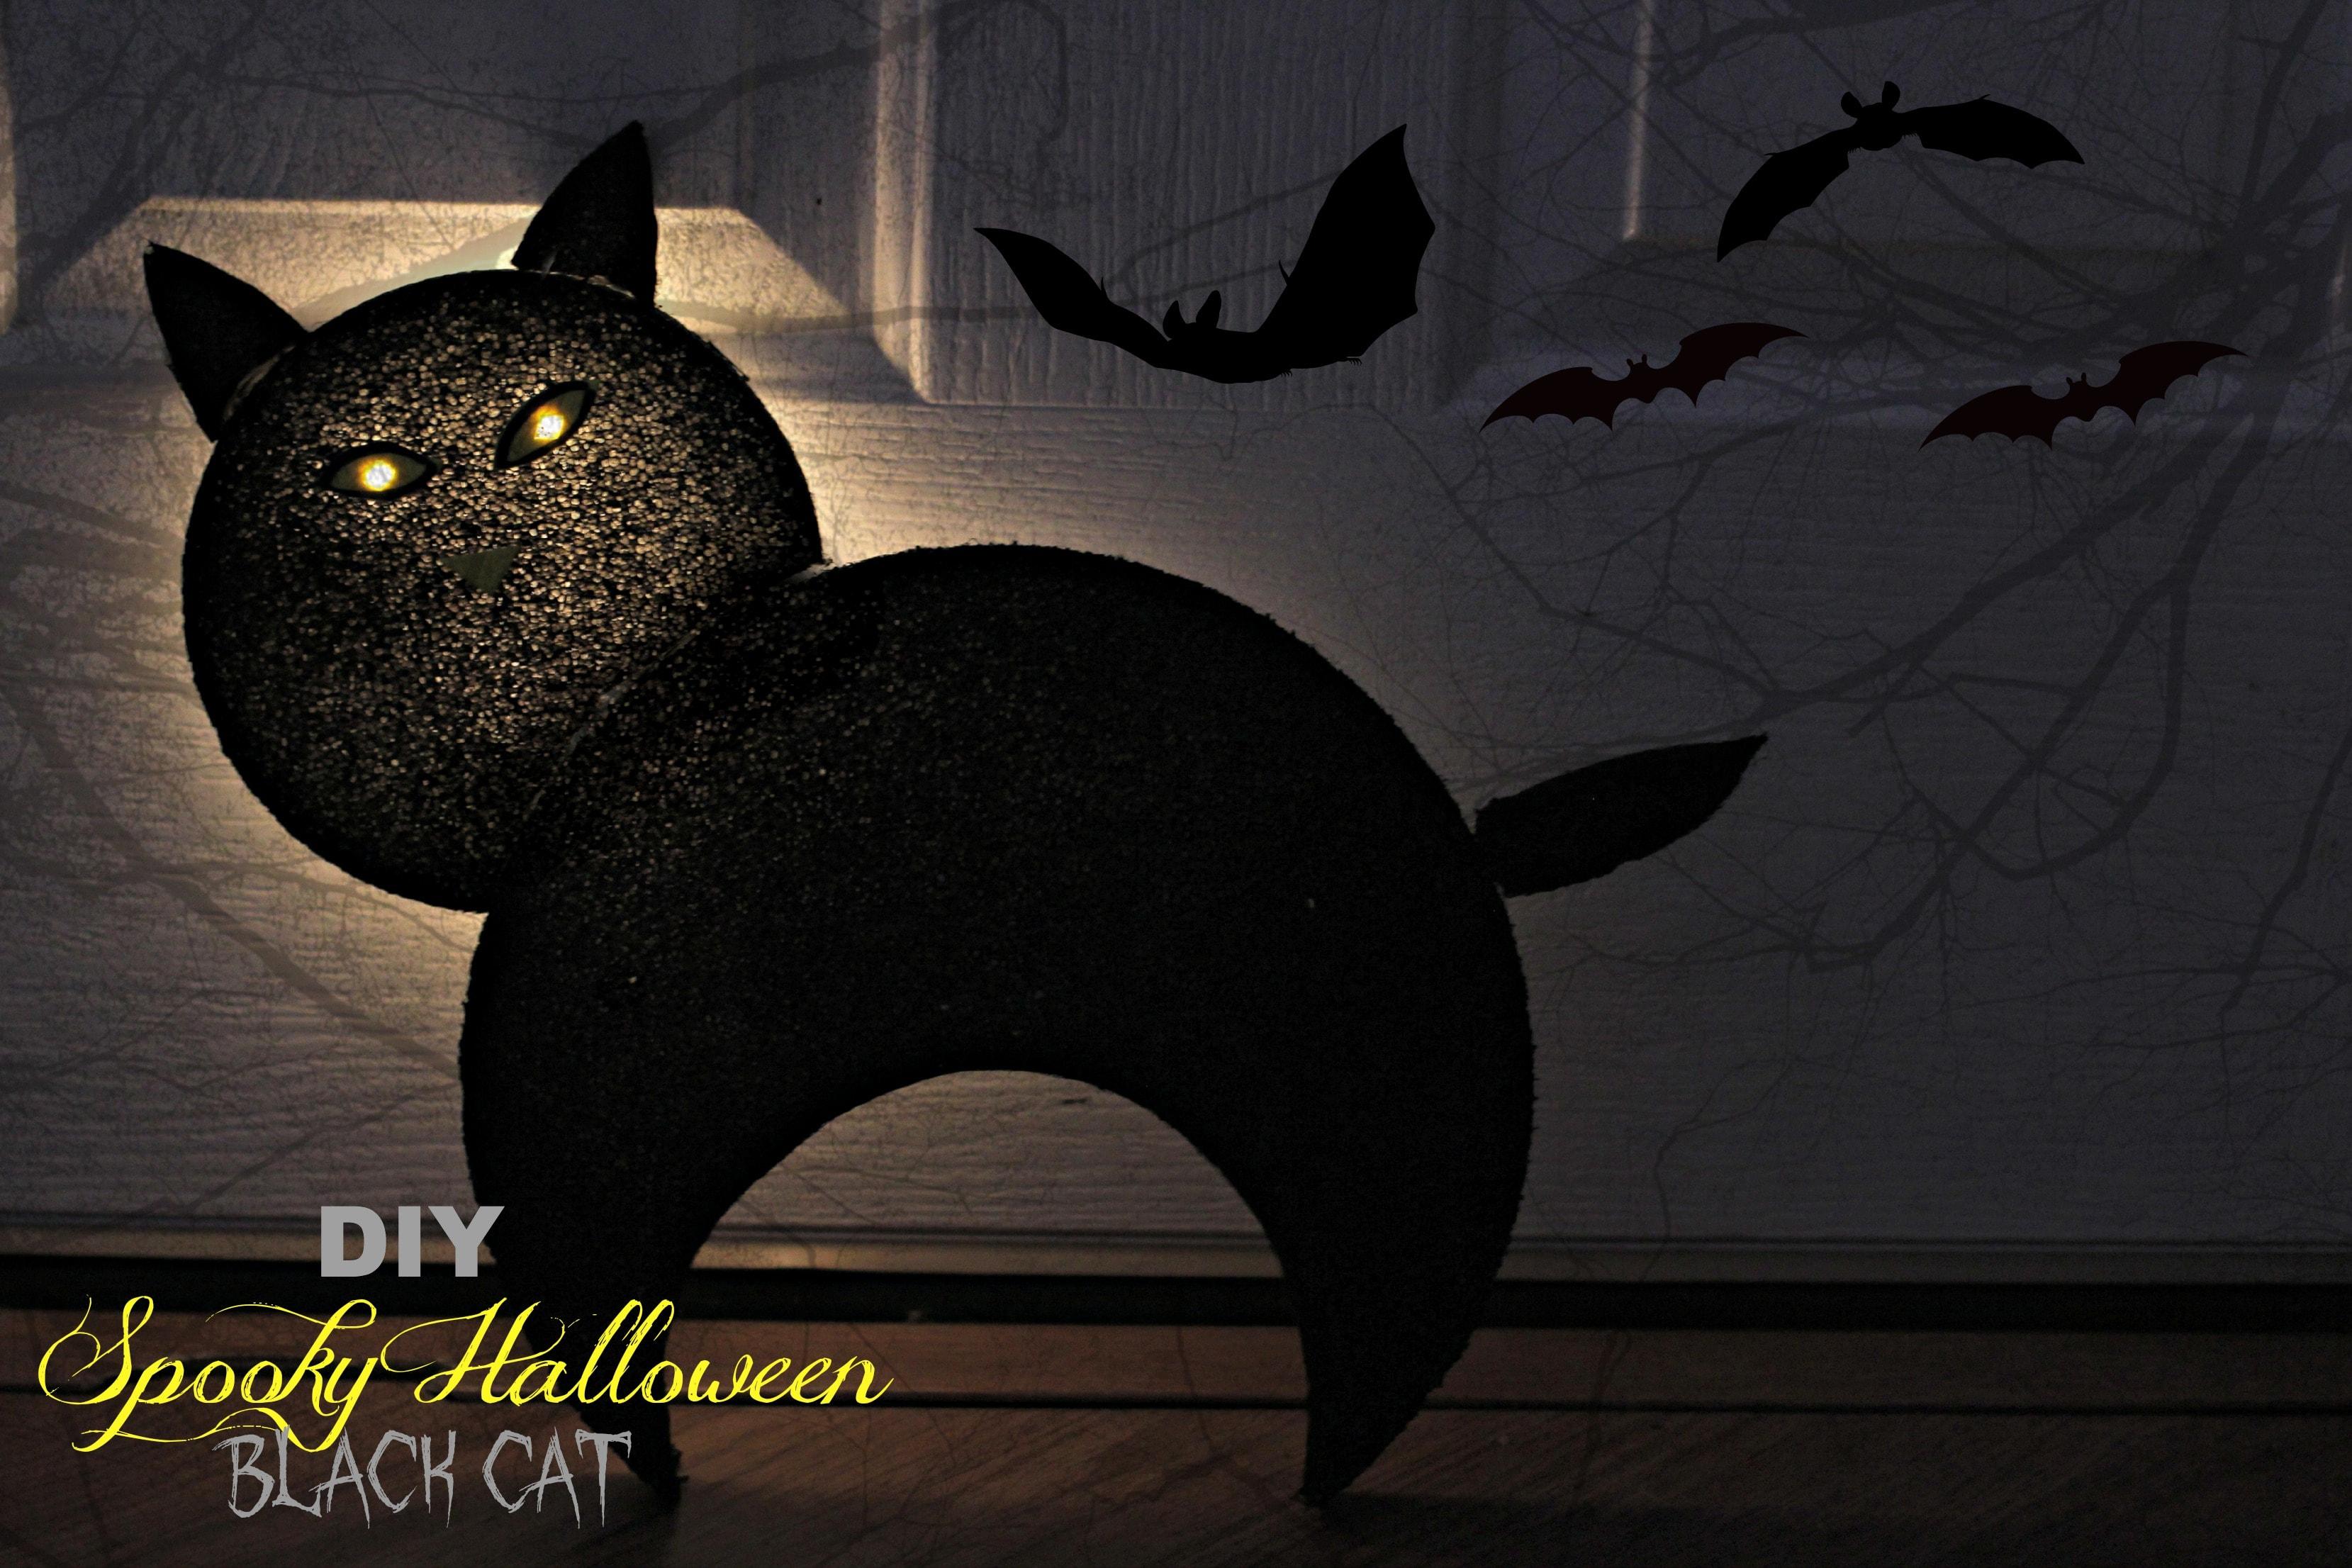 DIY Spooky Halloween Black Cat Tutorial with Lighted Eyes